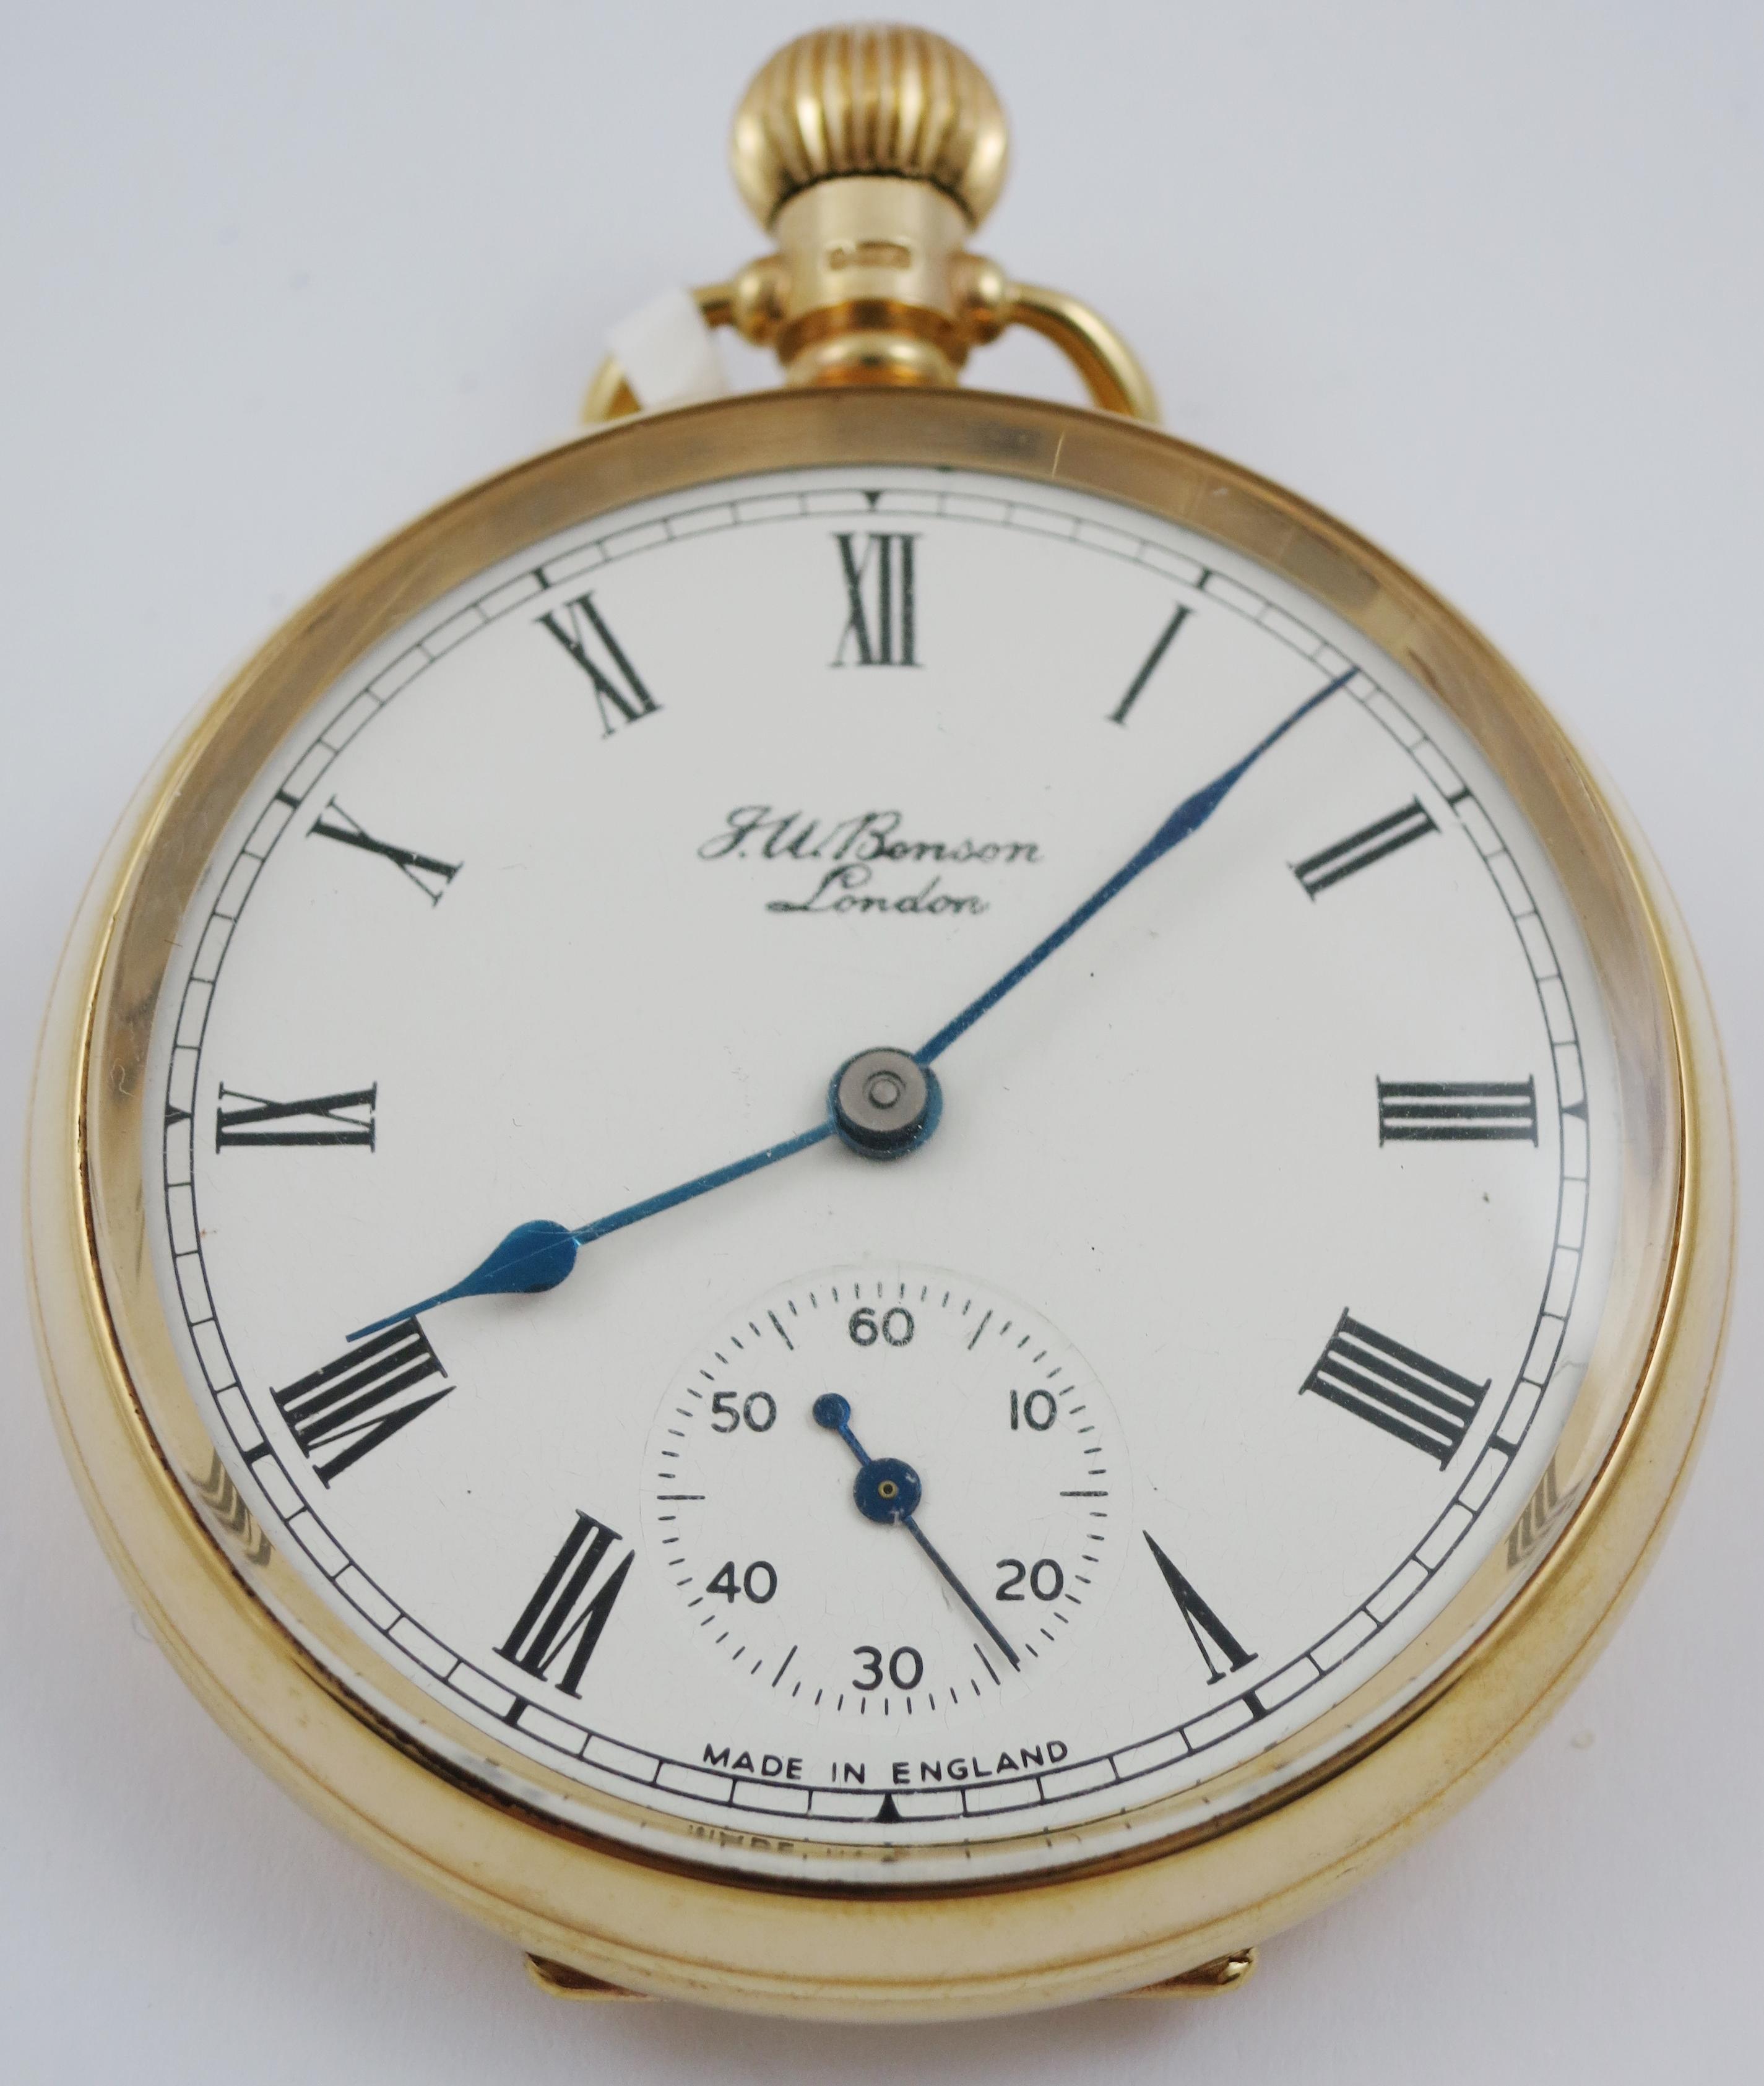 CIRCA. 1951 9CT GOLD JW BENSON LONDON OPEN FACE POCKET WATCH